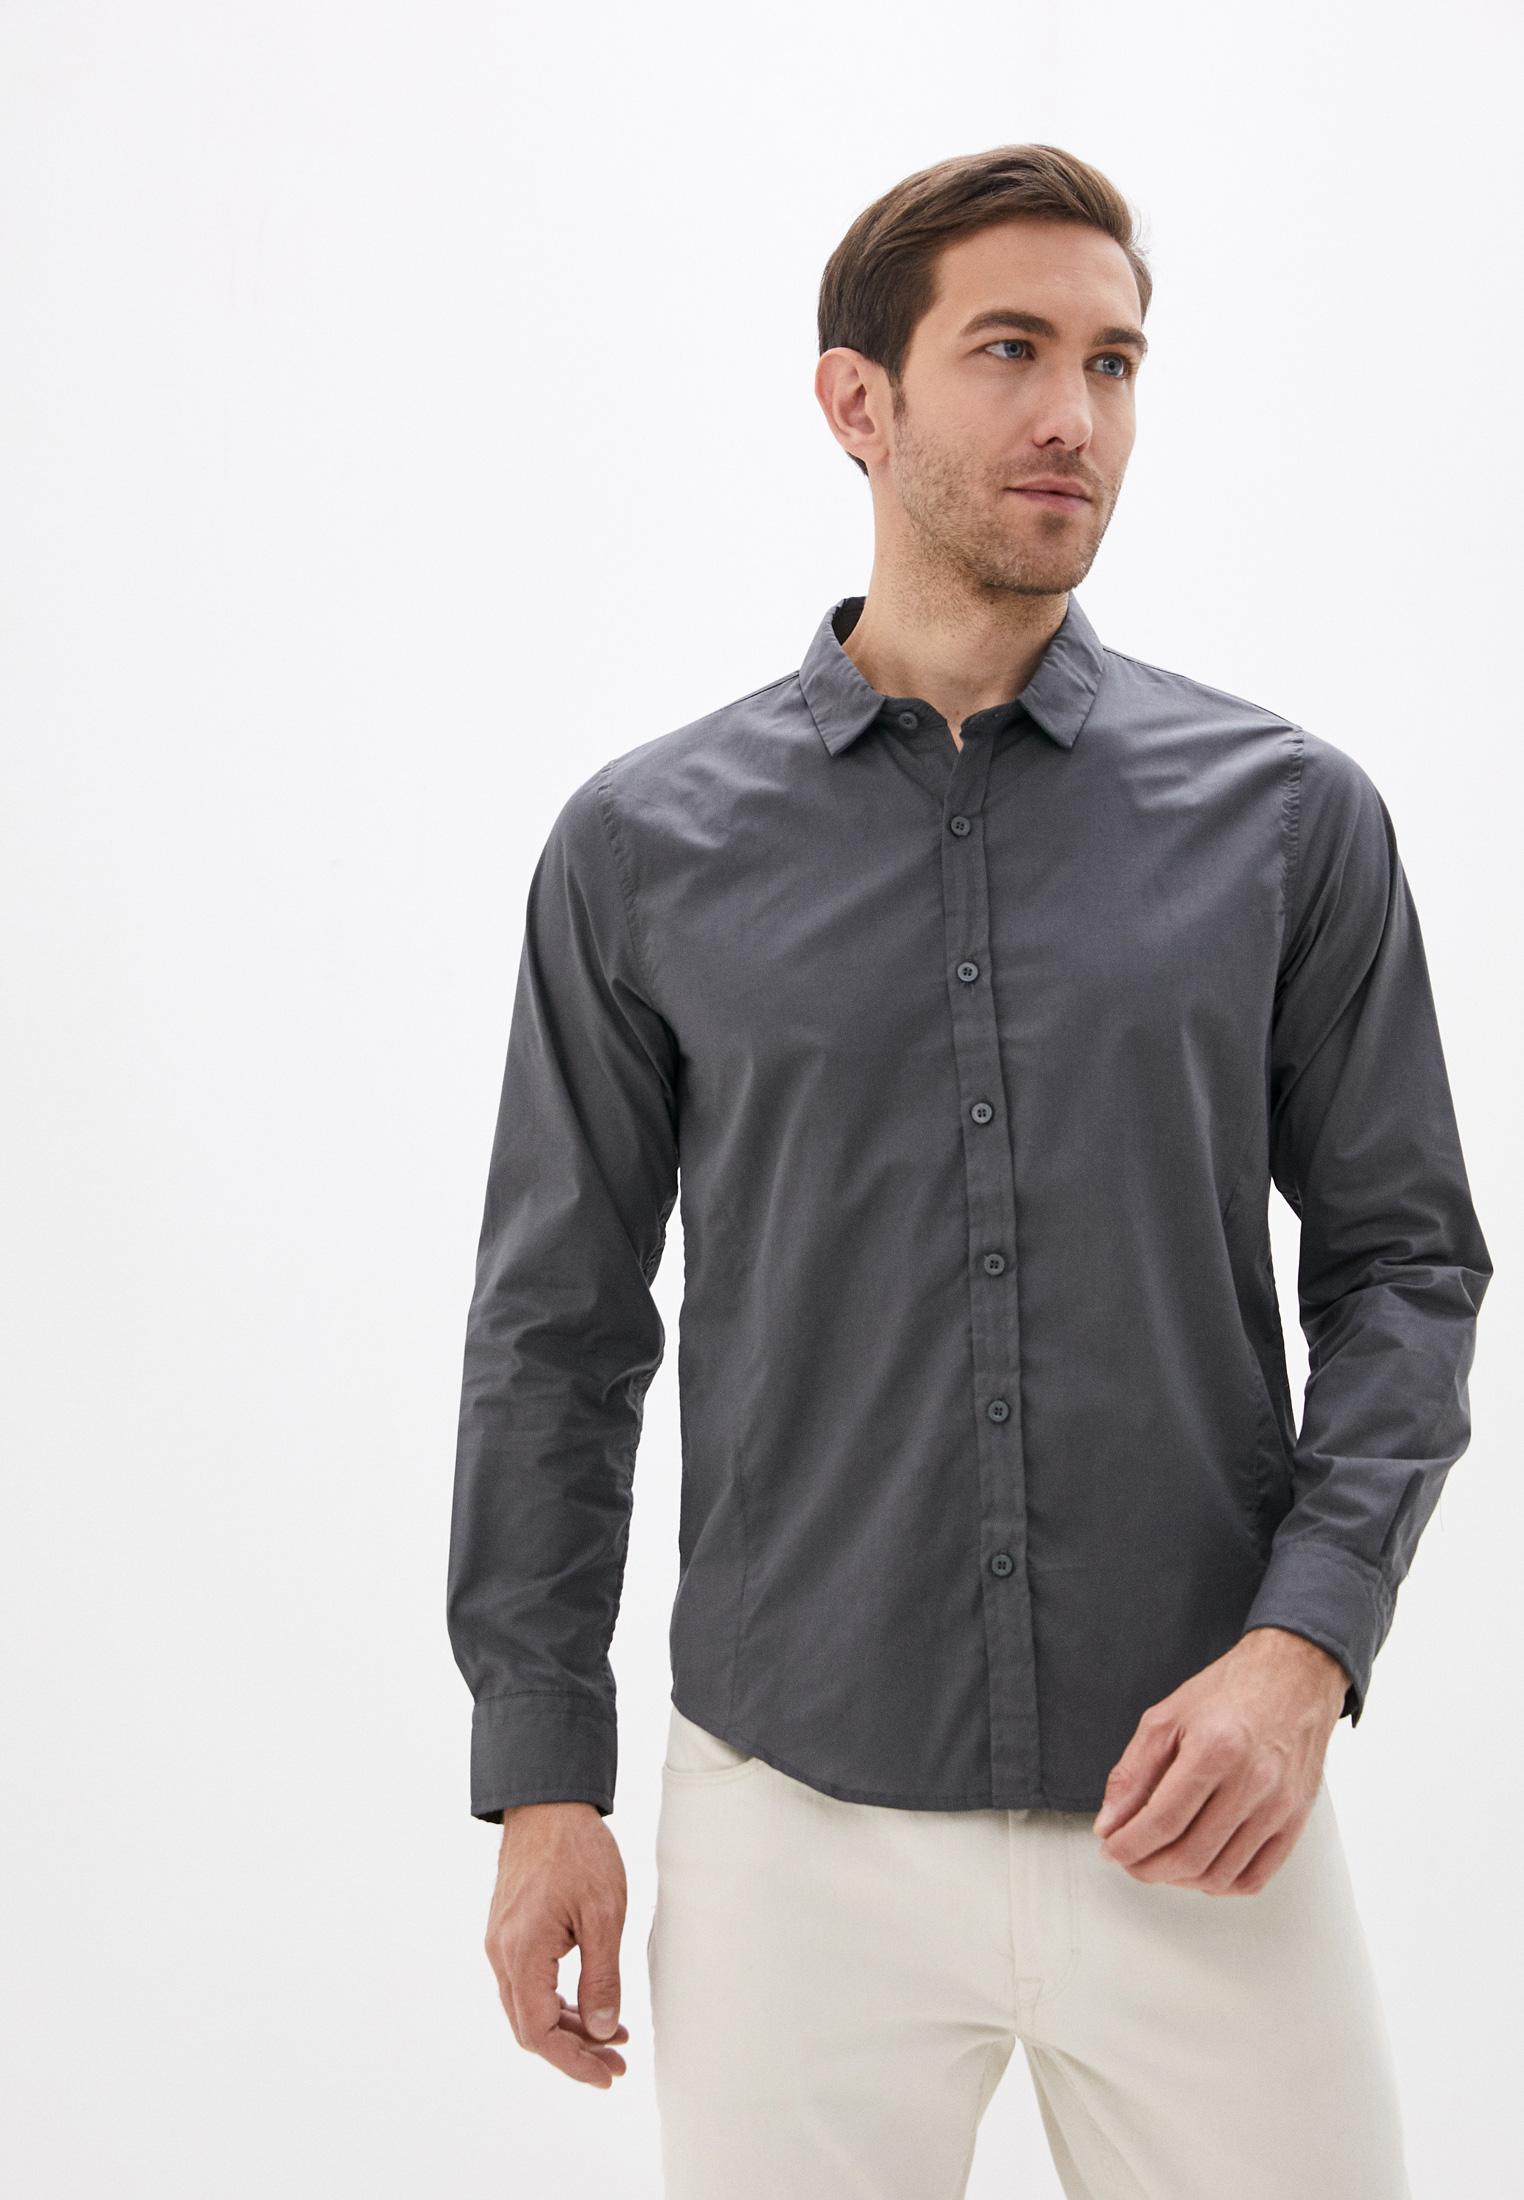 Рубашка с длинным рукавом Brave Soul (Брейв Соул) Рубашка Brave Soul